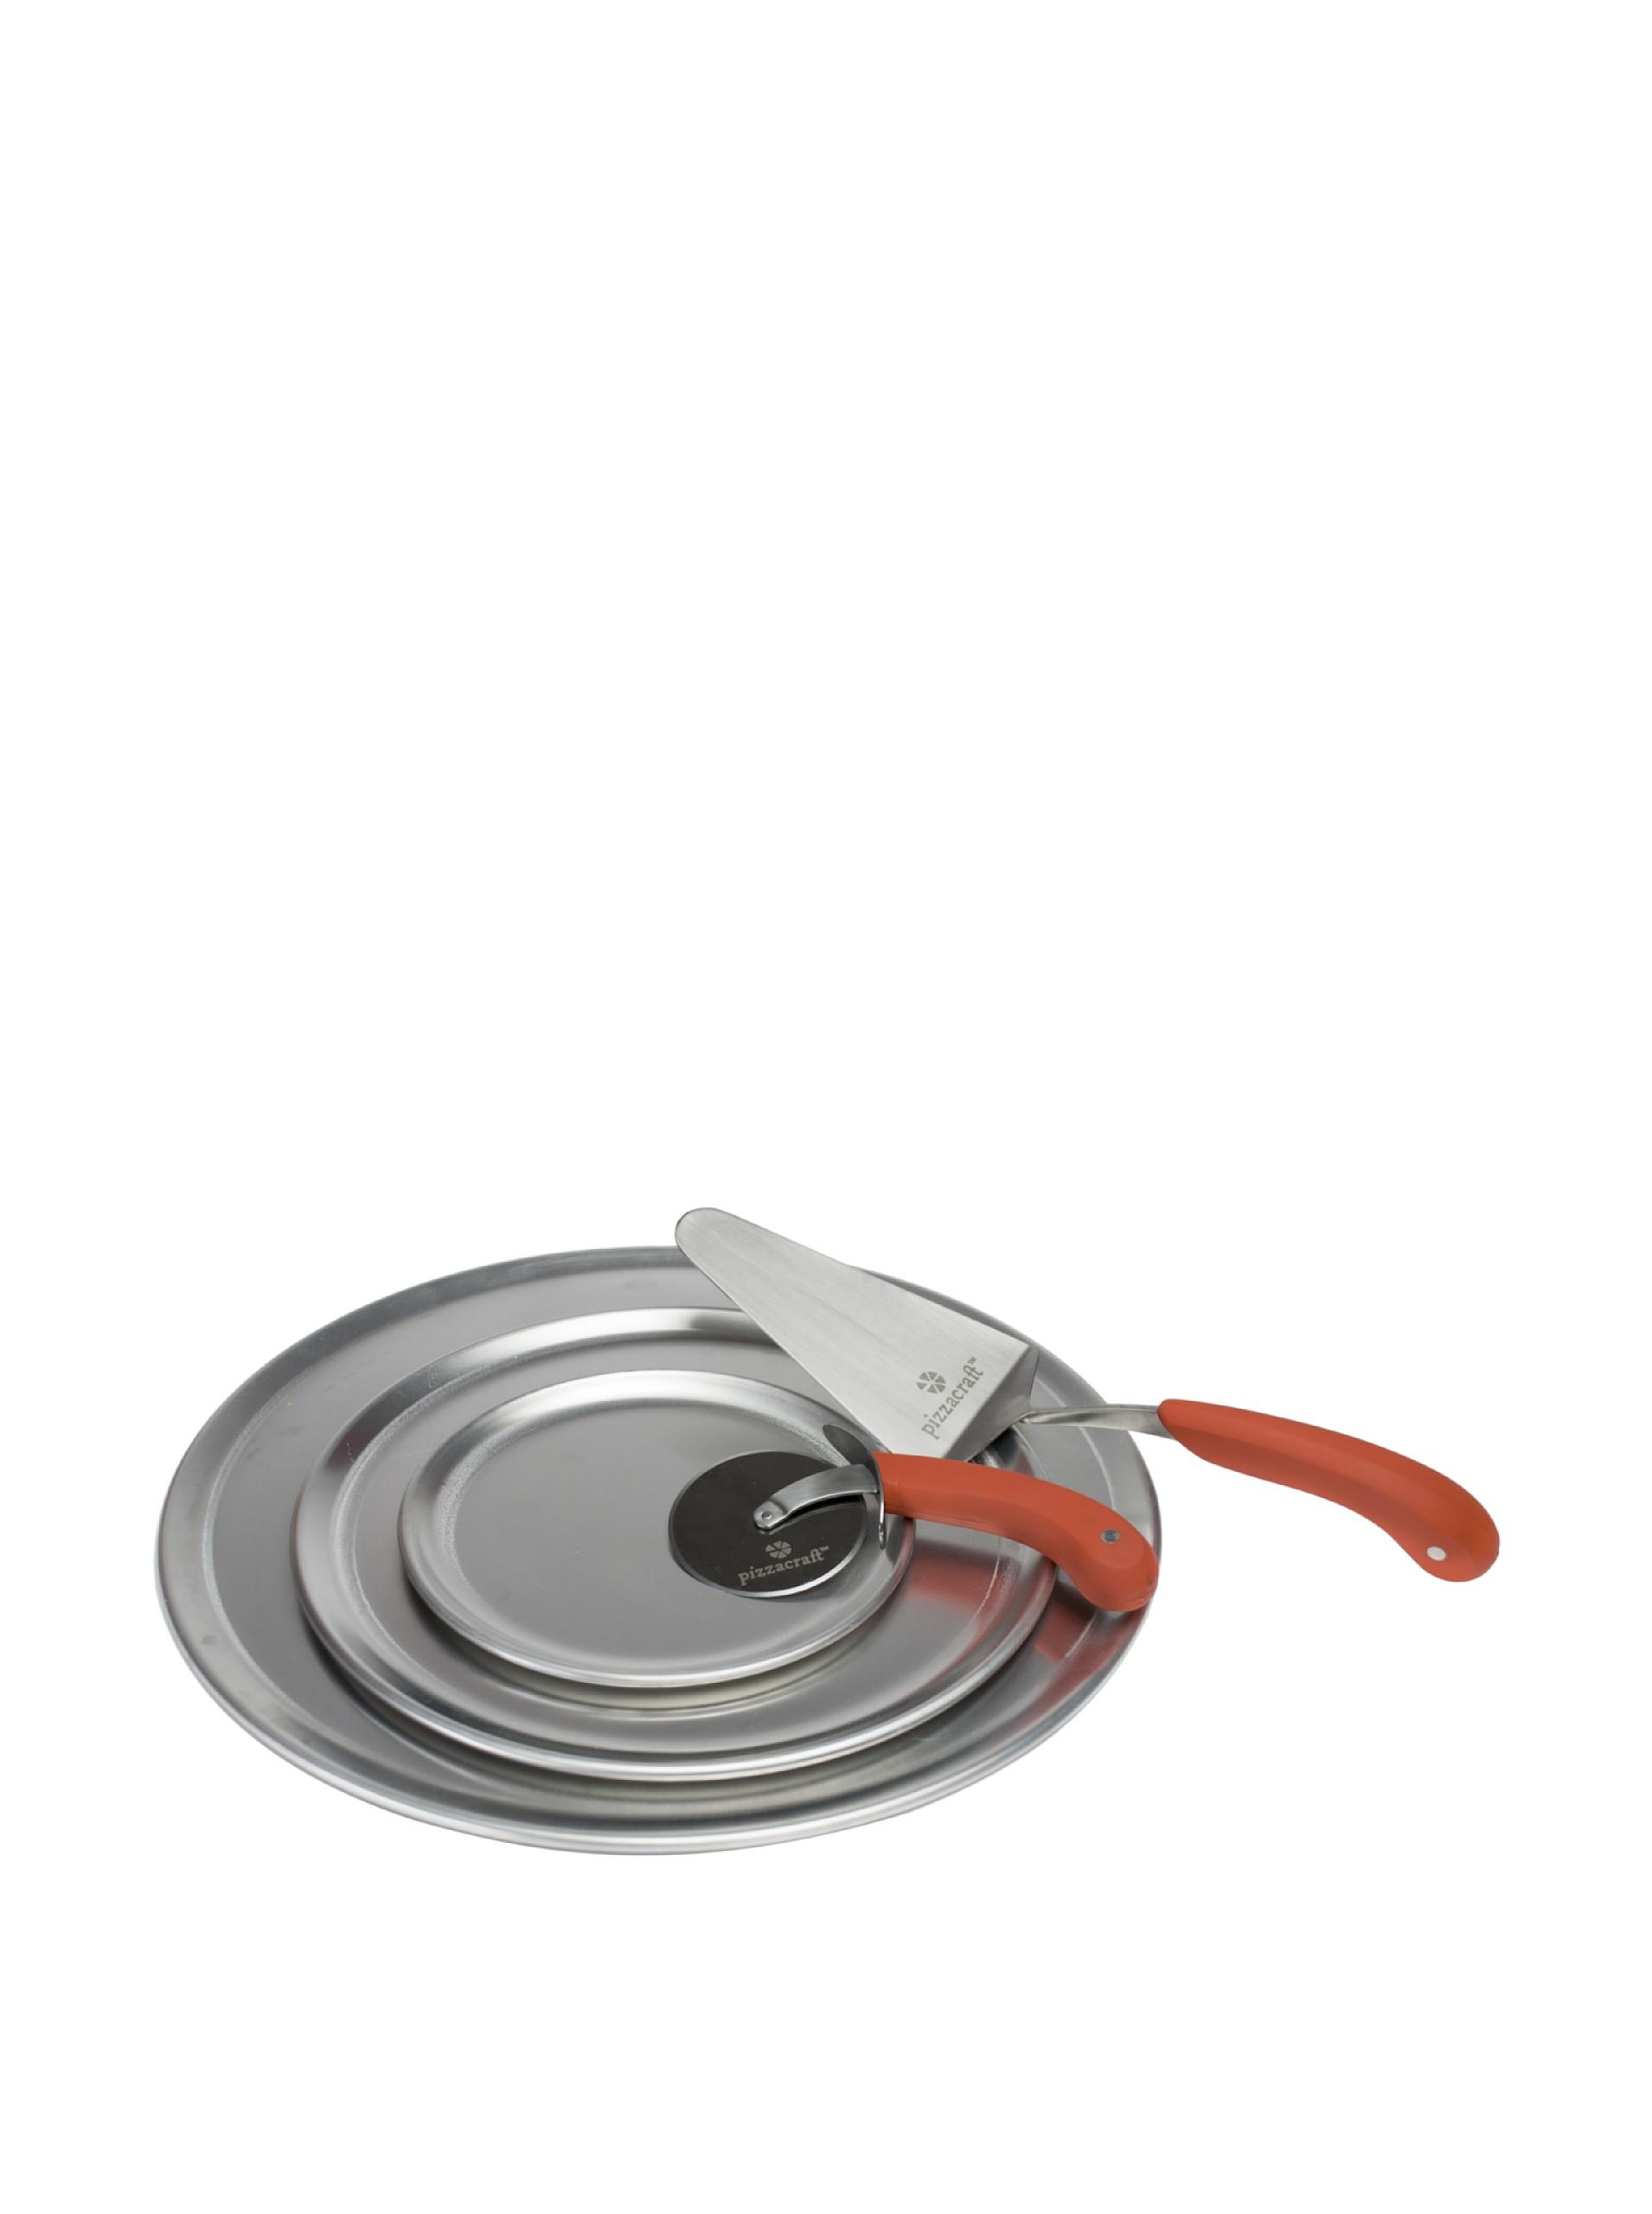 Pizzacraft Aluminum Pizza Pan Set (Orange)